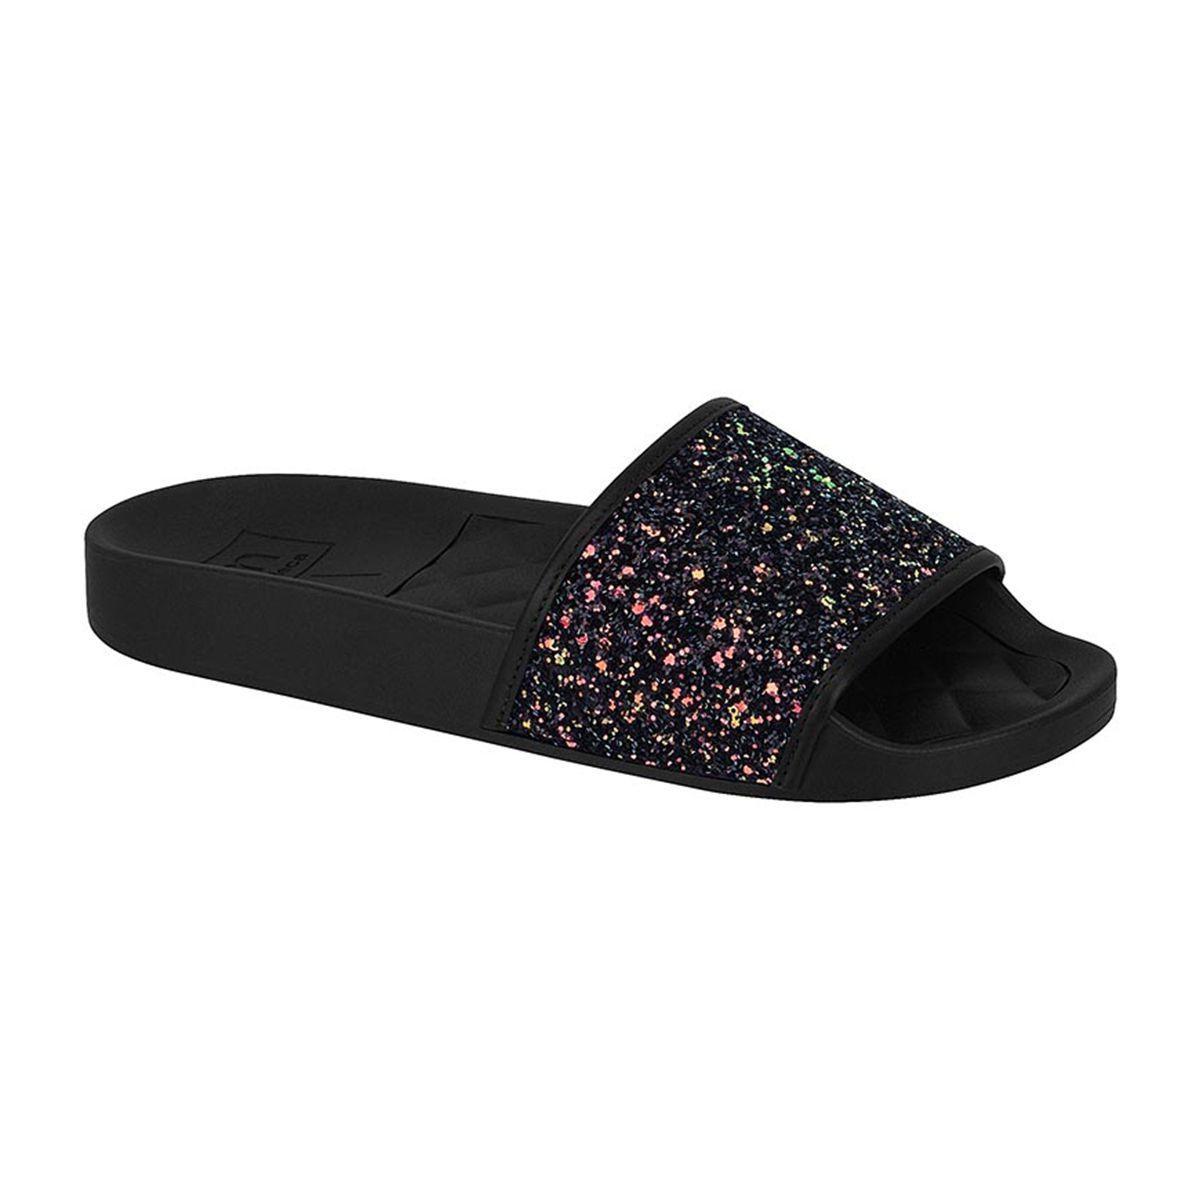 Chinelo Feminino Slide Glitter Moleca 5414.107